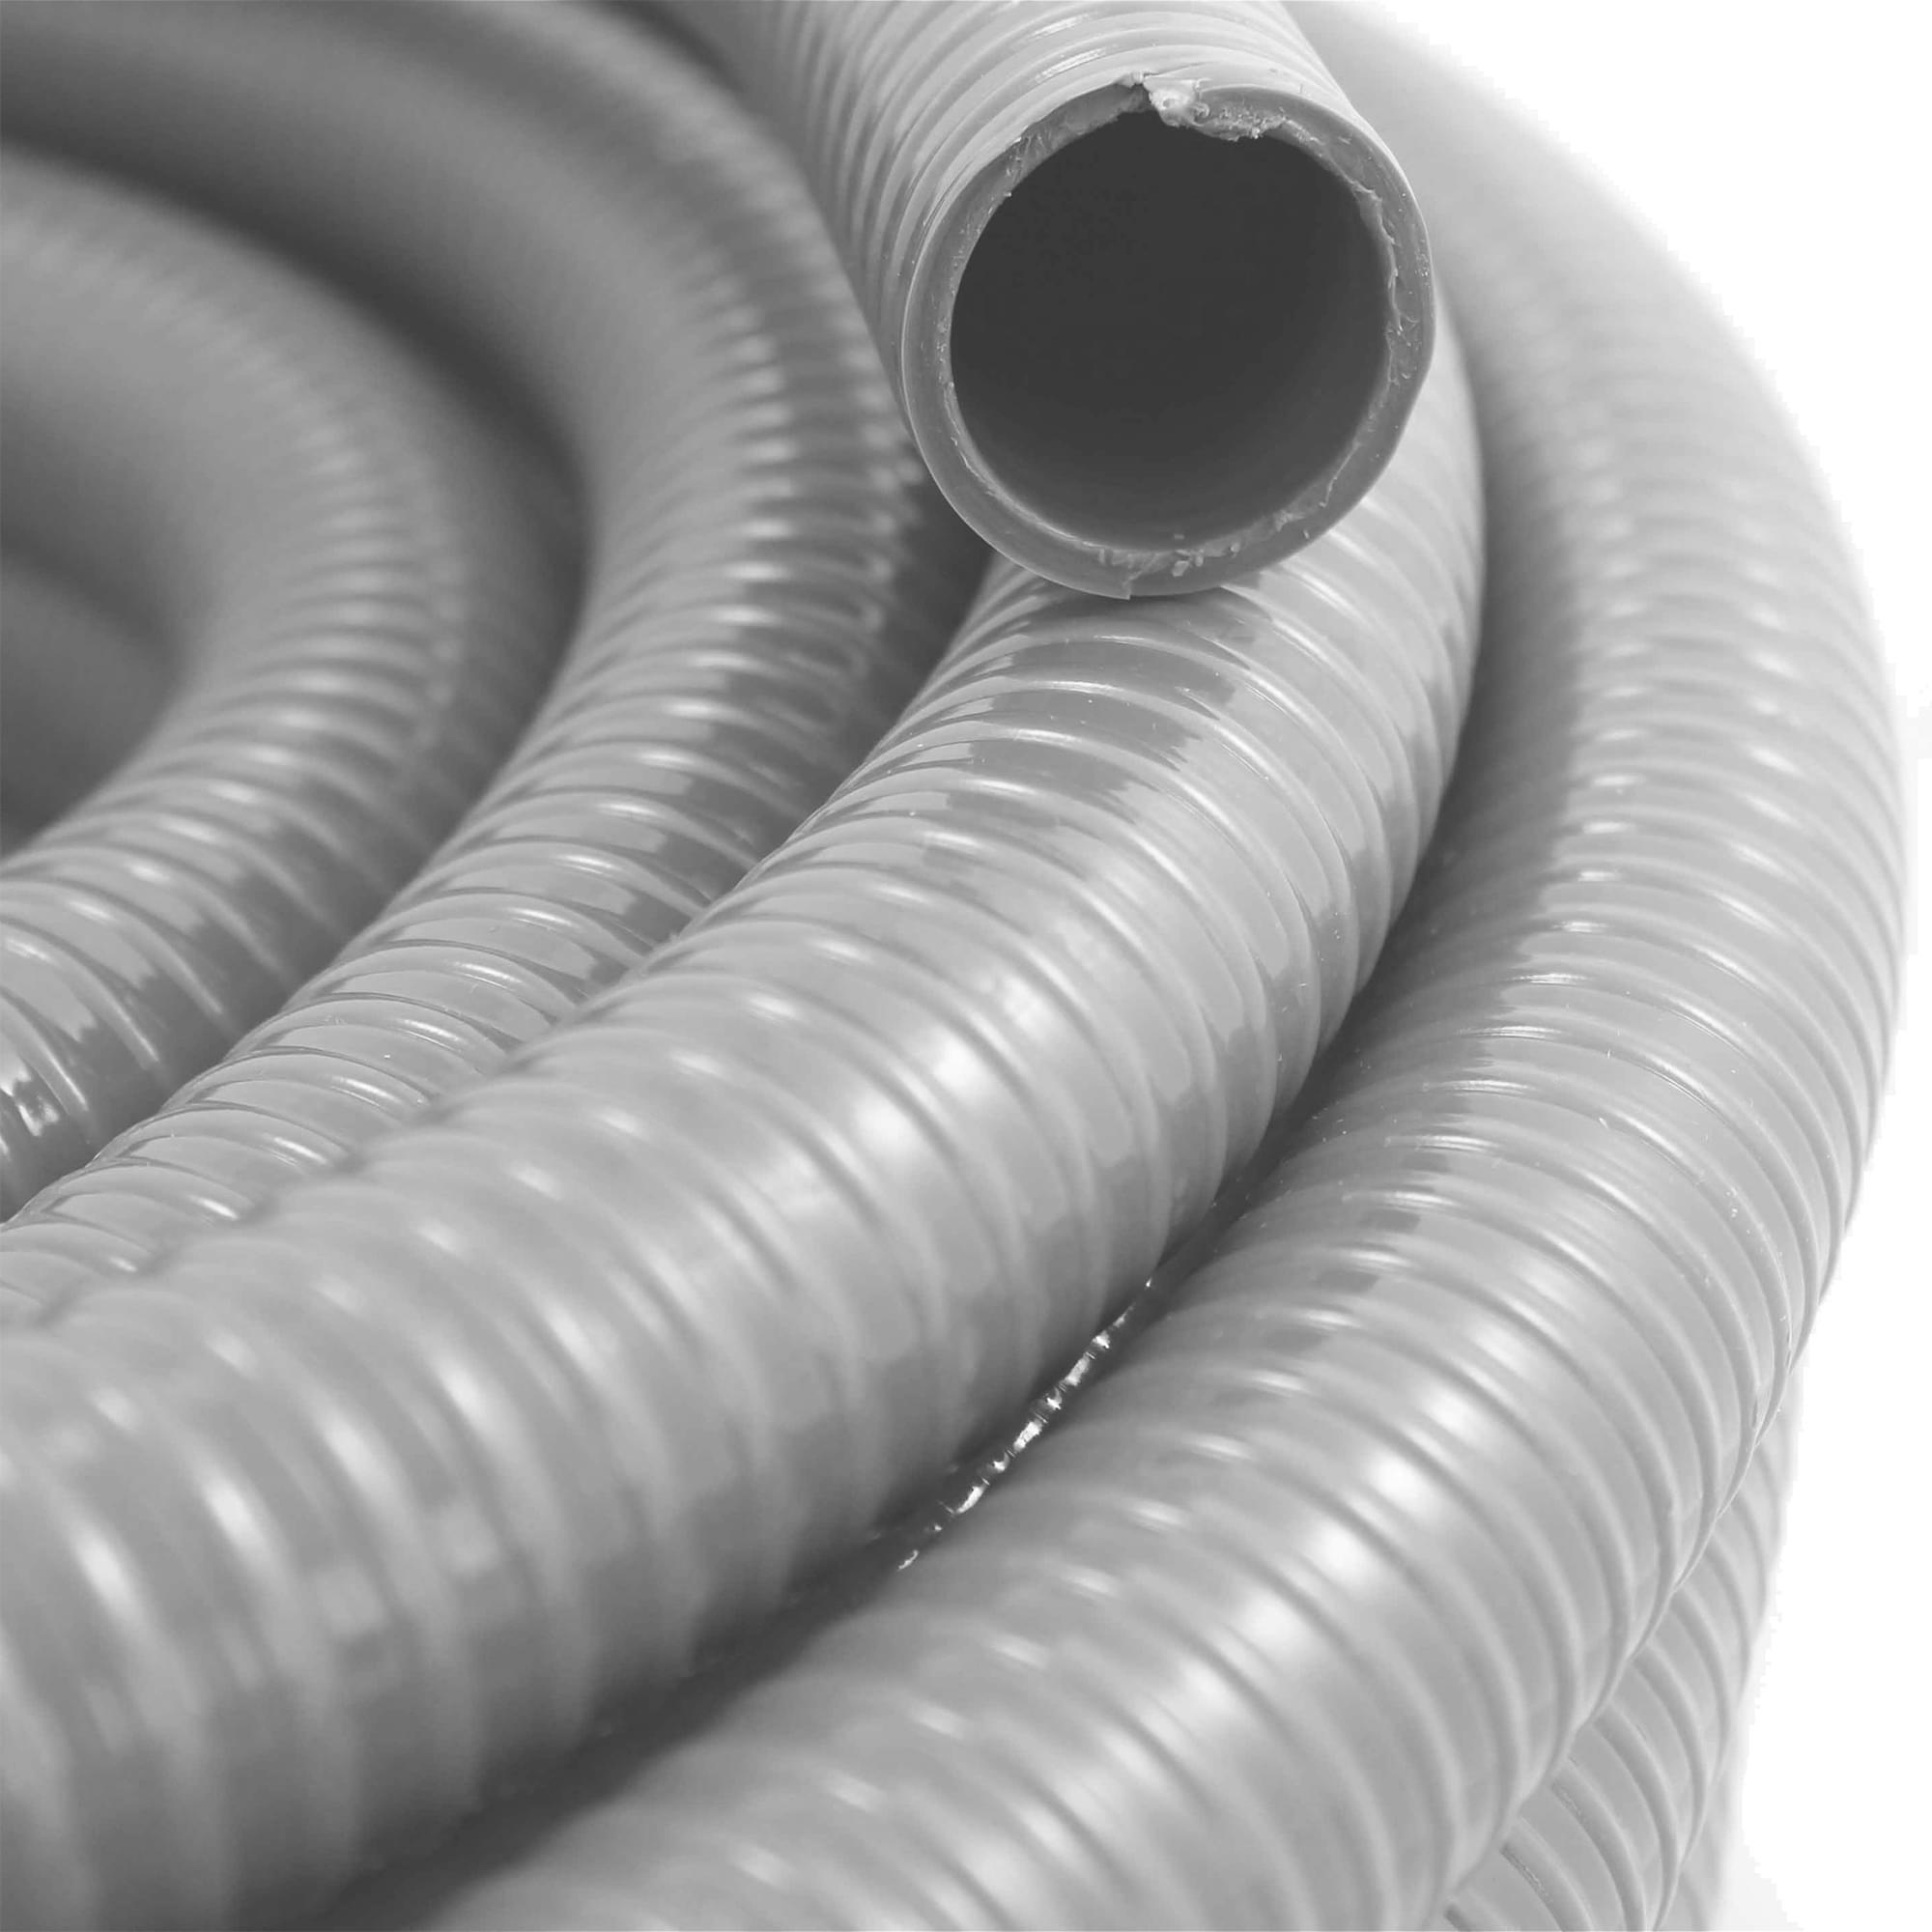 ElastoFlex Flexible Hose 2 inch x 50 ft Coil | Pool Supplies Canada